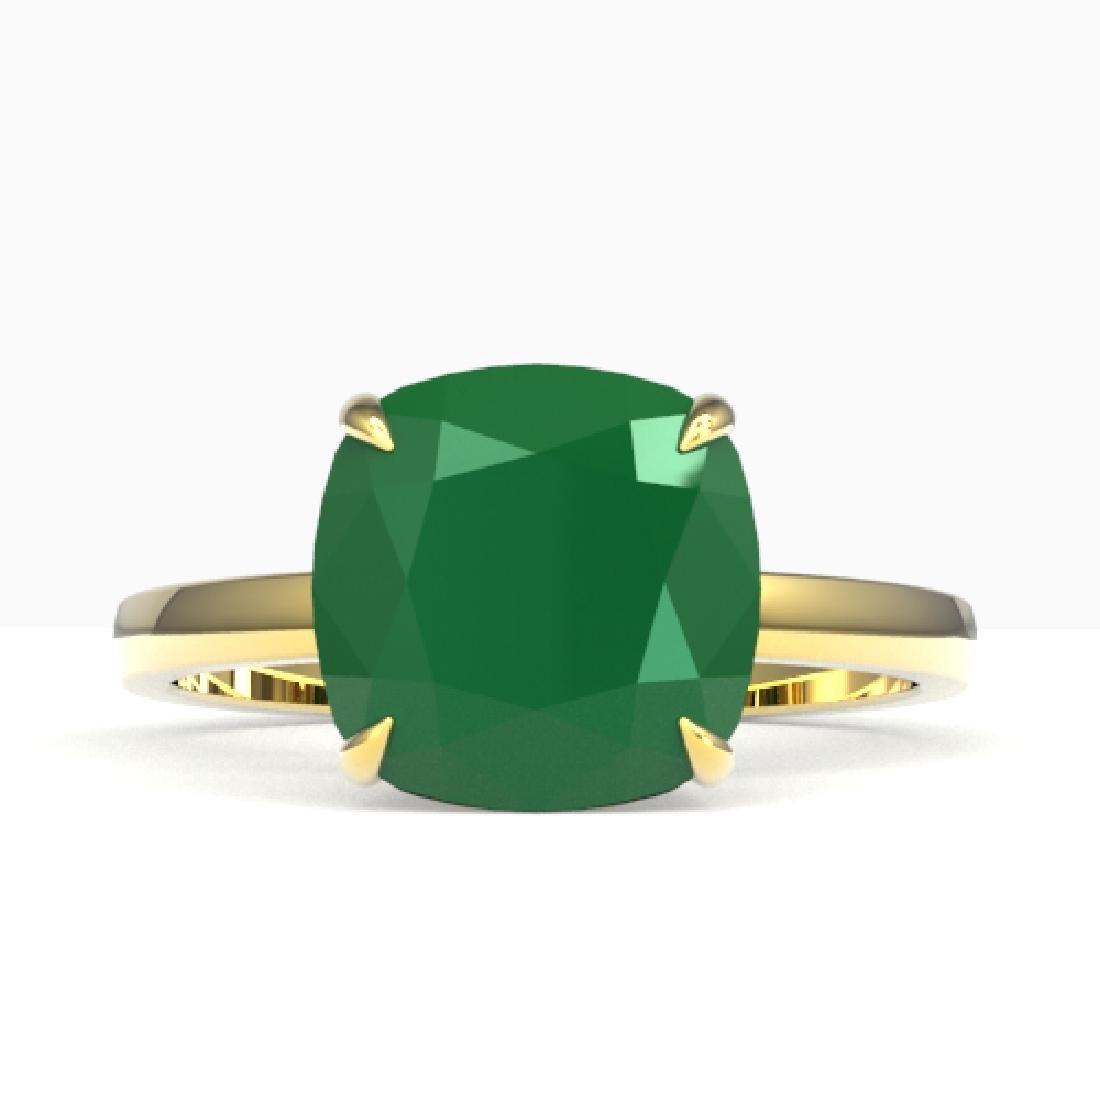 6 CTW Cushion Cut Emerald Designer Inspired Engagement